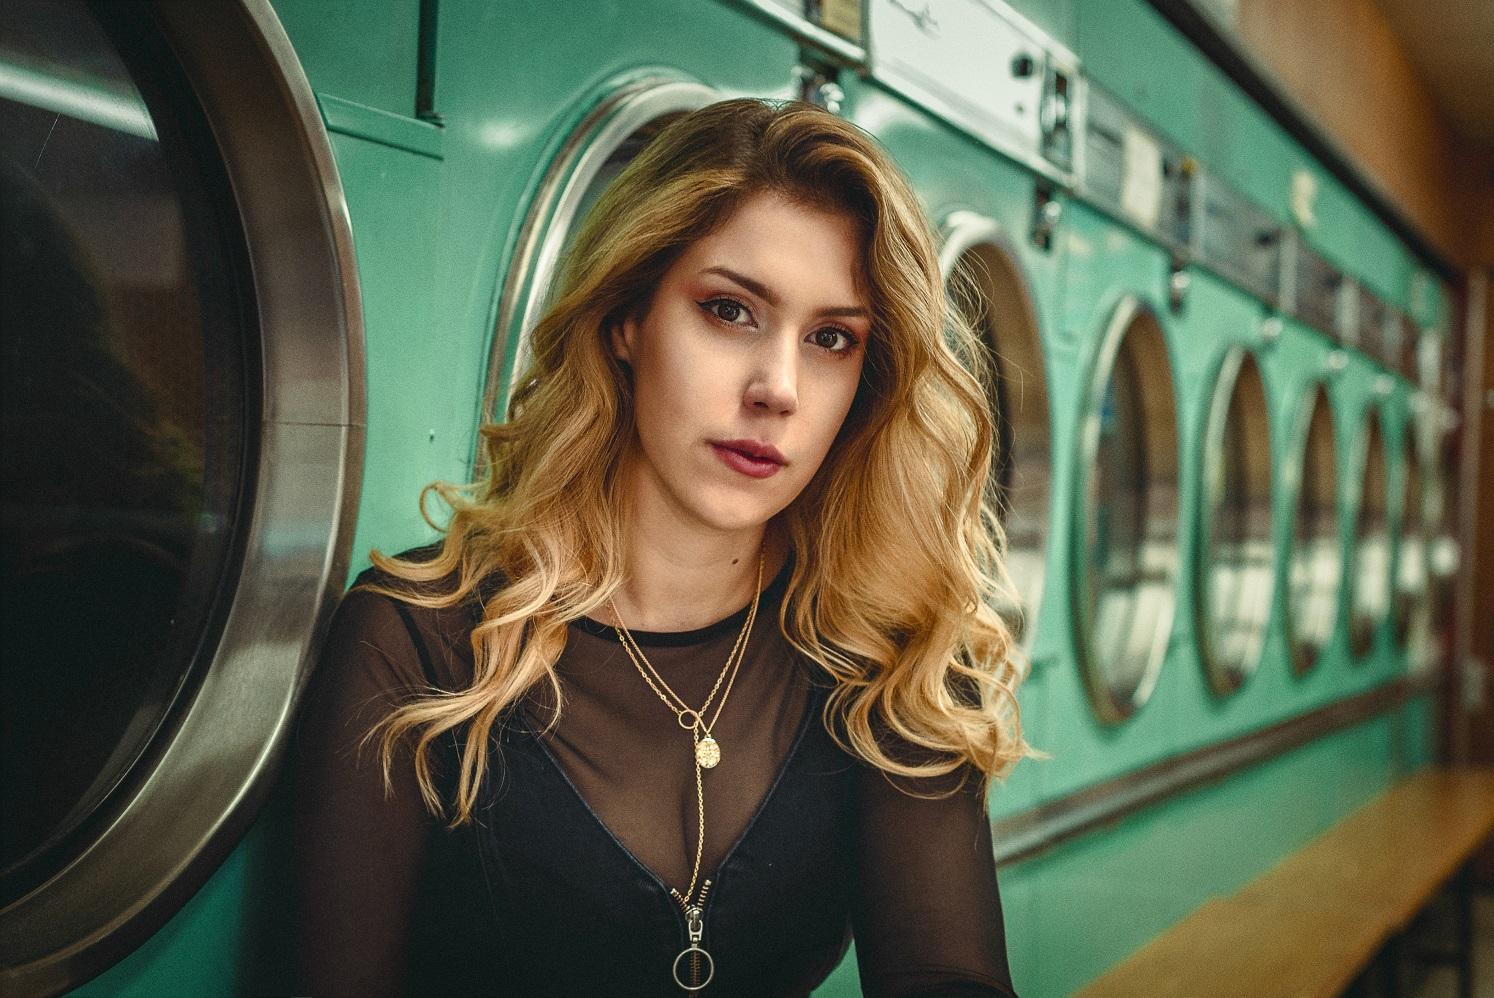 Natalie Shay Yesterday © Max Giorgeschi